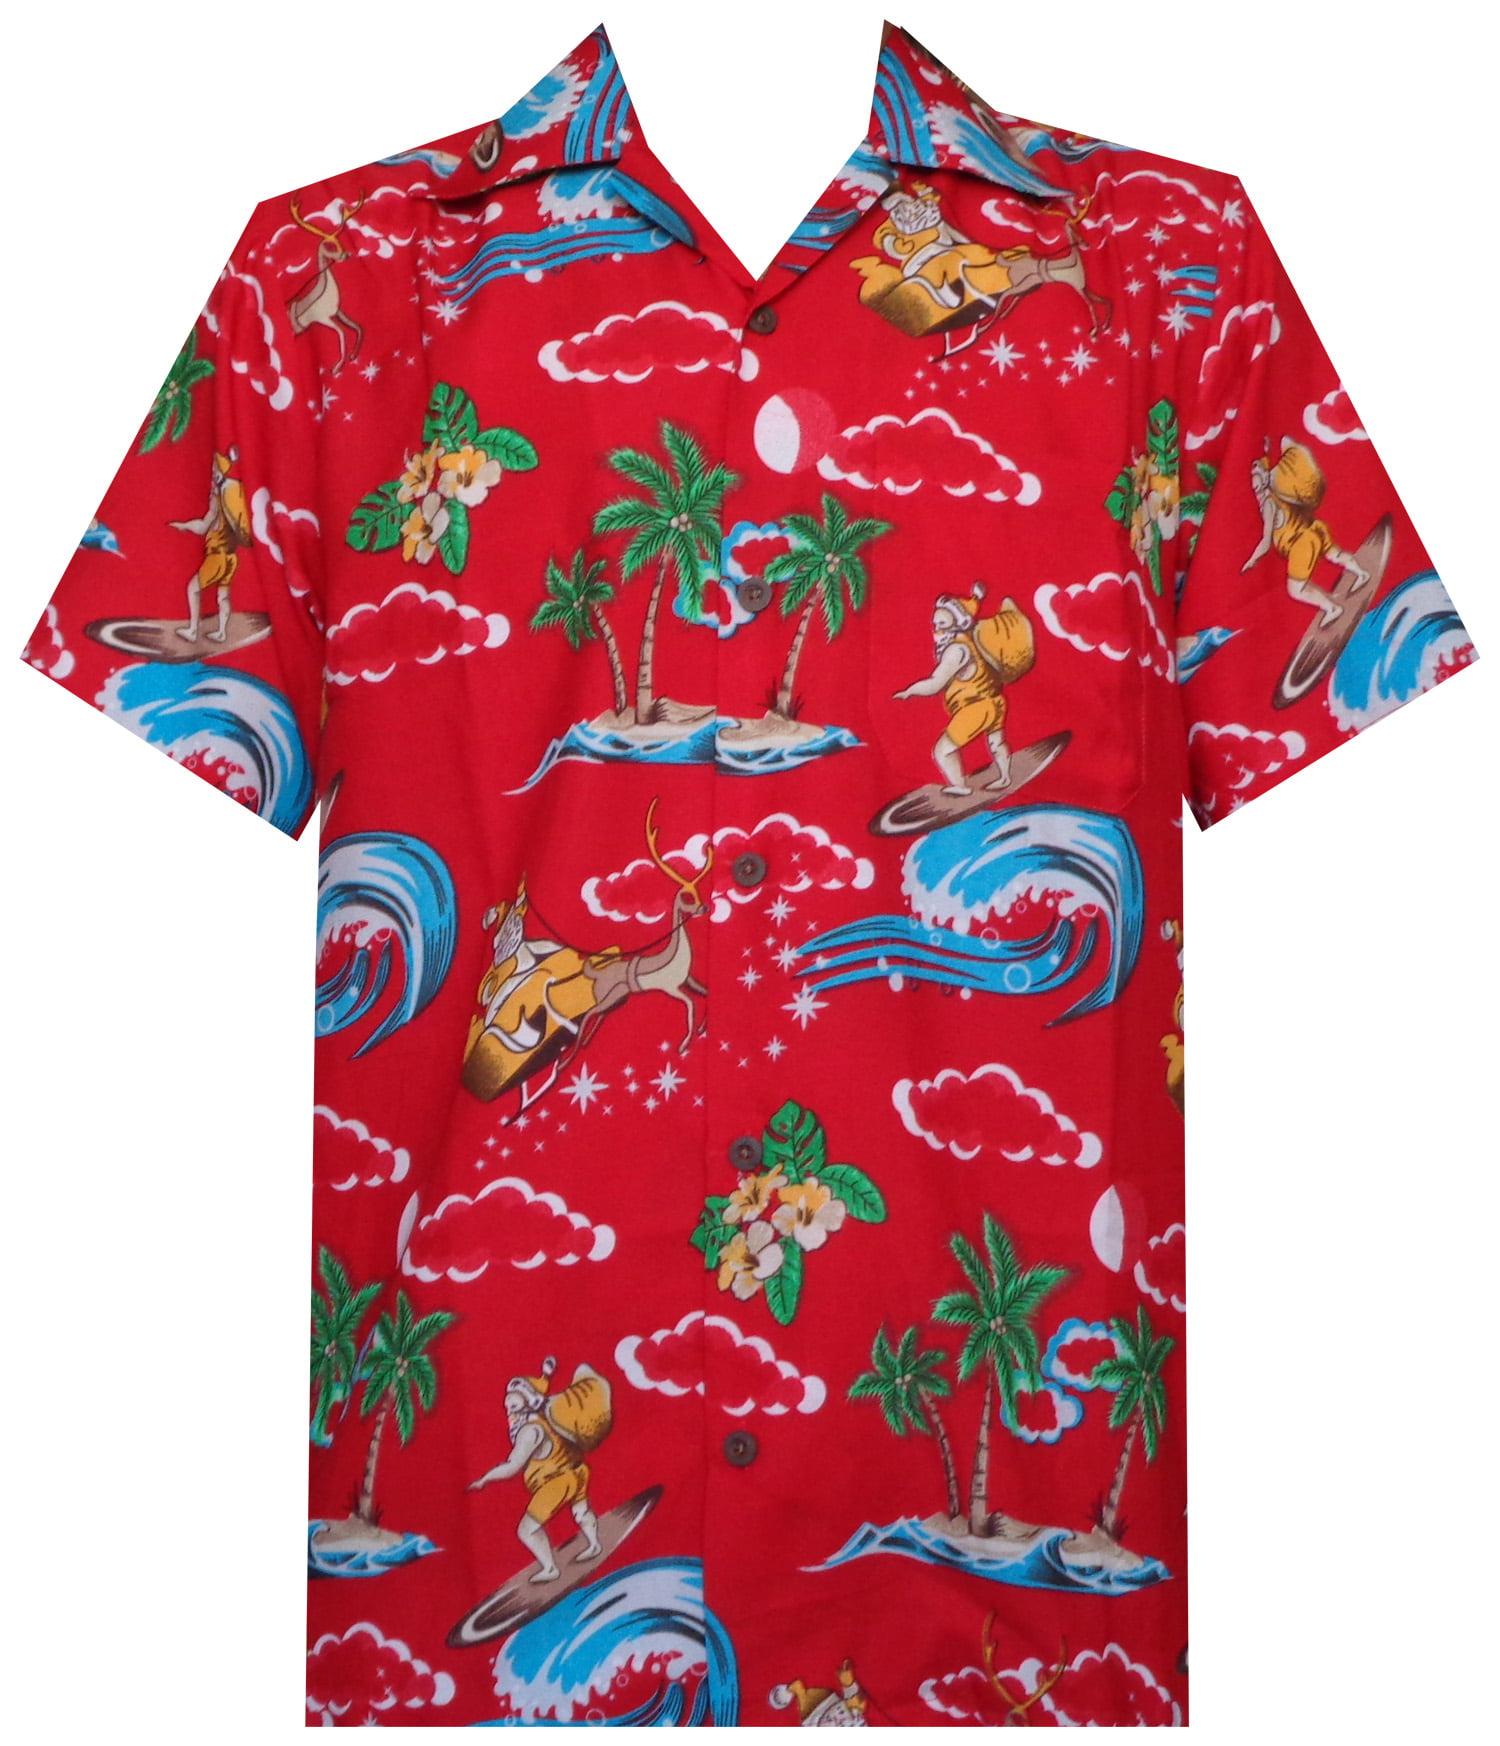 a54f18f43 Holiday - Hawaiian Shirt Mens Christmas Santa Claus Party Aloha Holiday  Beach - Walmart.com